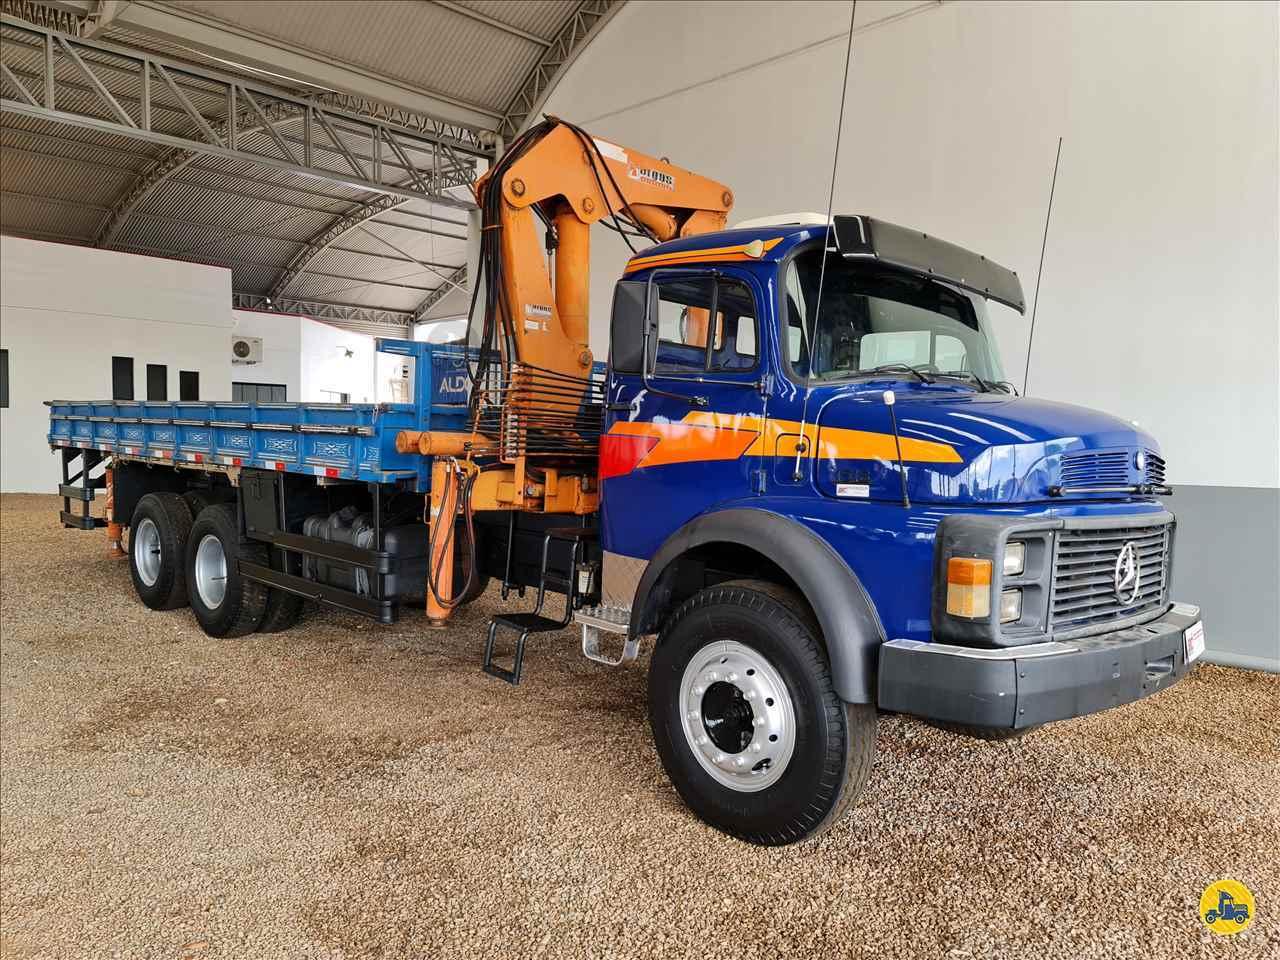 CAMINHAO MERCEDES-BENZ MB 1518 Guincho Munck Truck 6x2 Sorriso Caminhões SORRISO MATO GROSSO MT